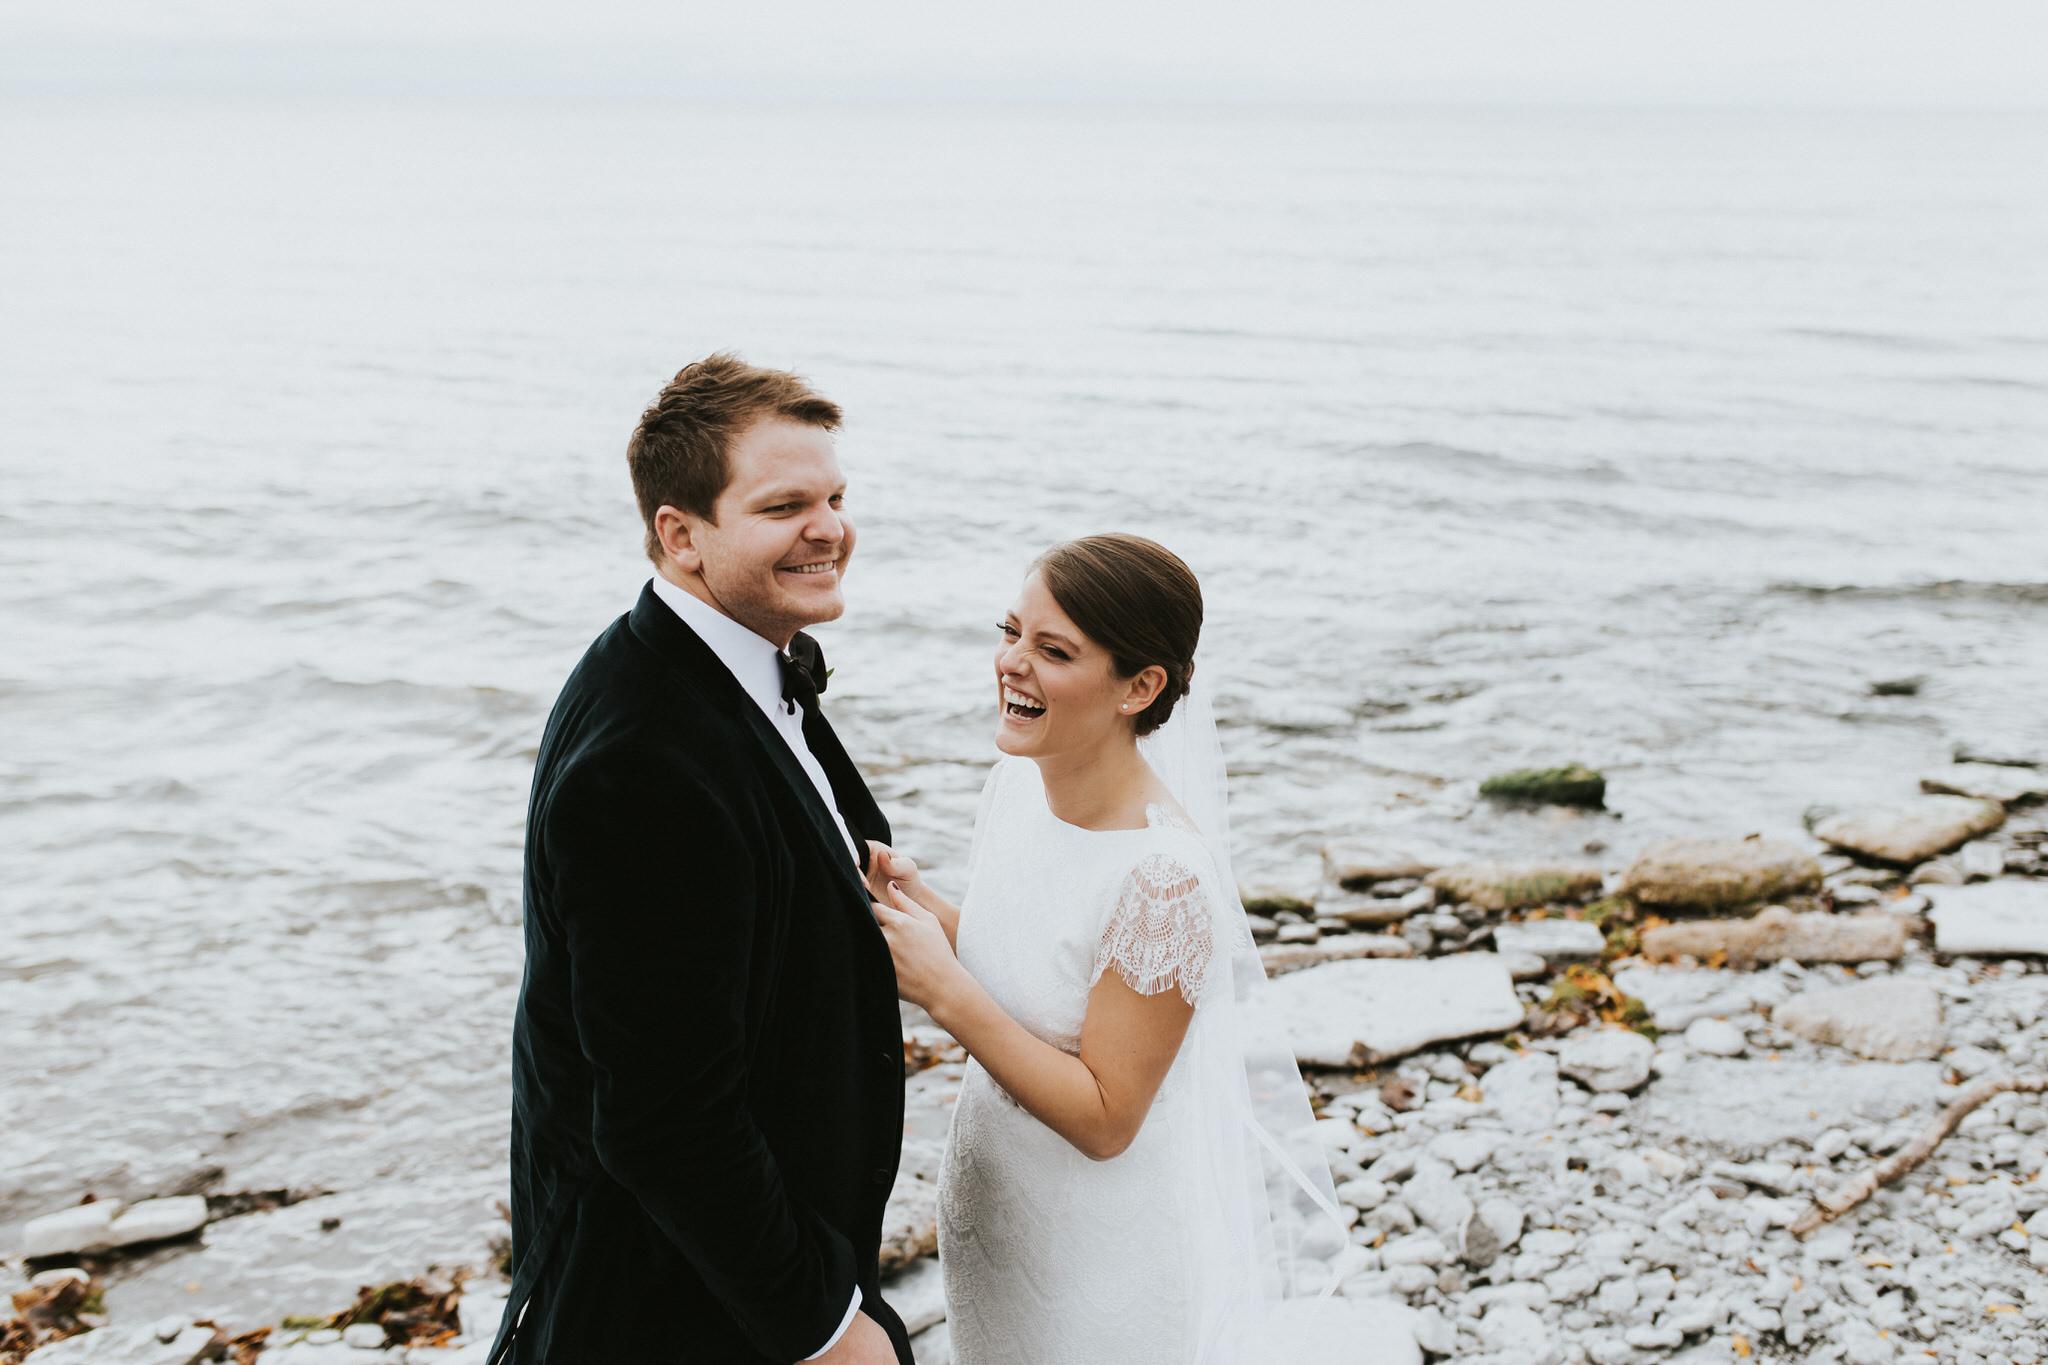 scarletoneillphotography_weddingphotography_prince edward county weddings038.JPG